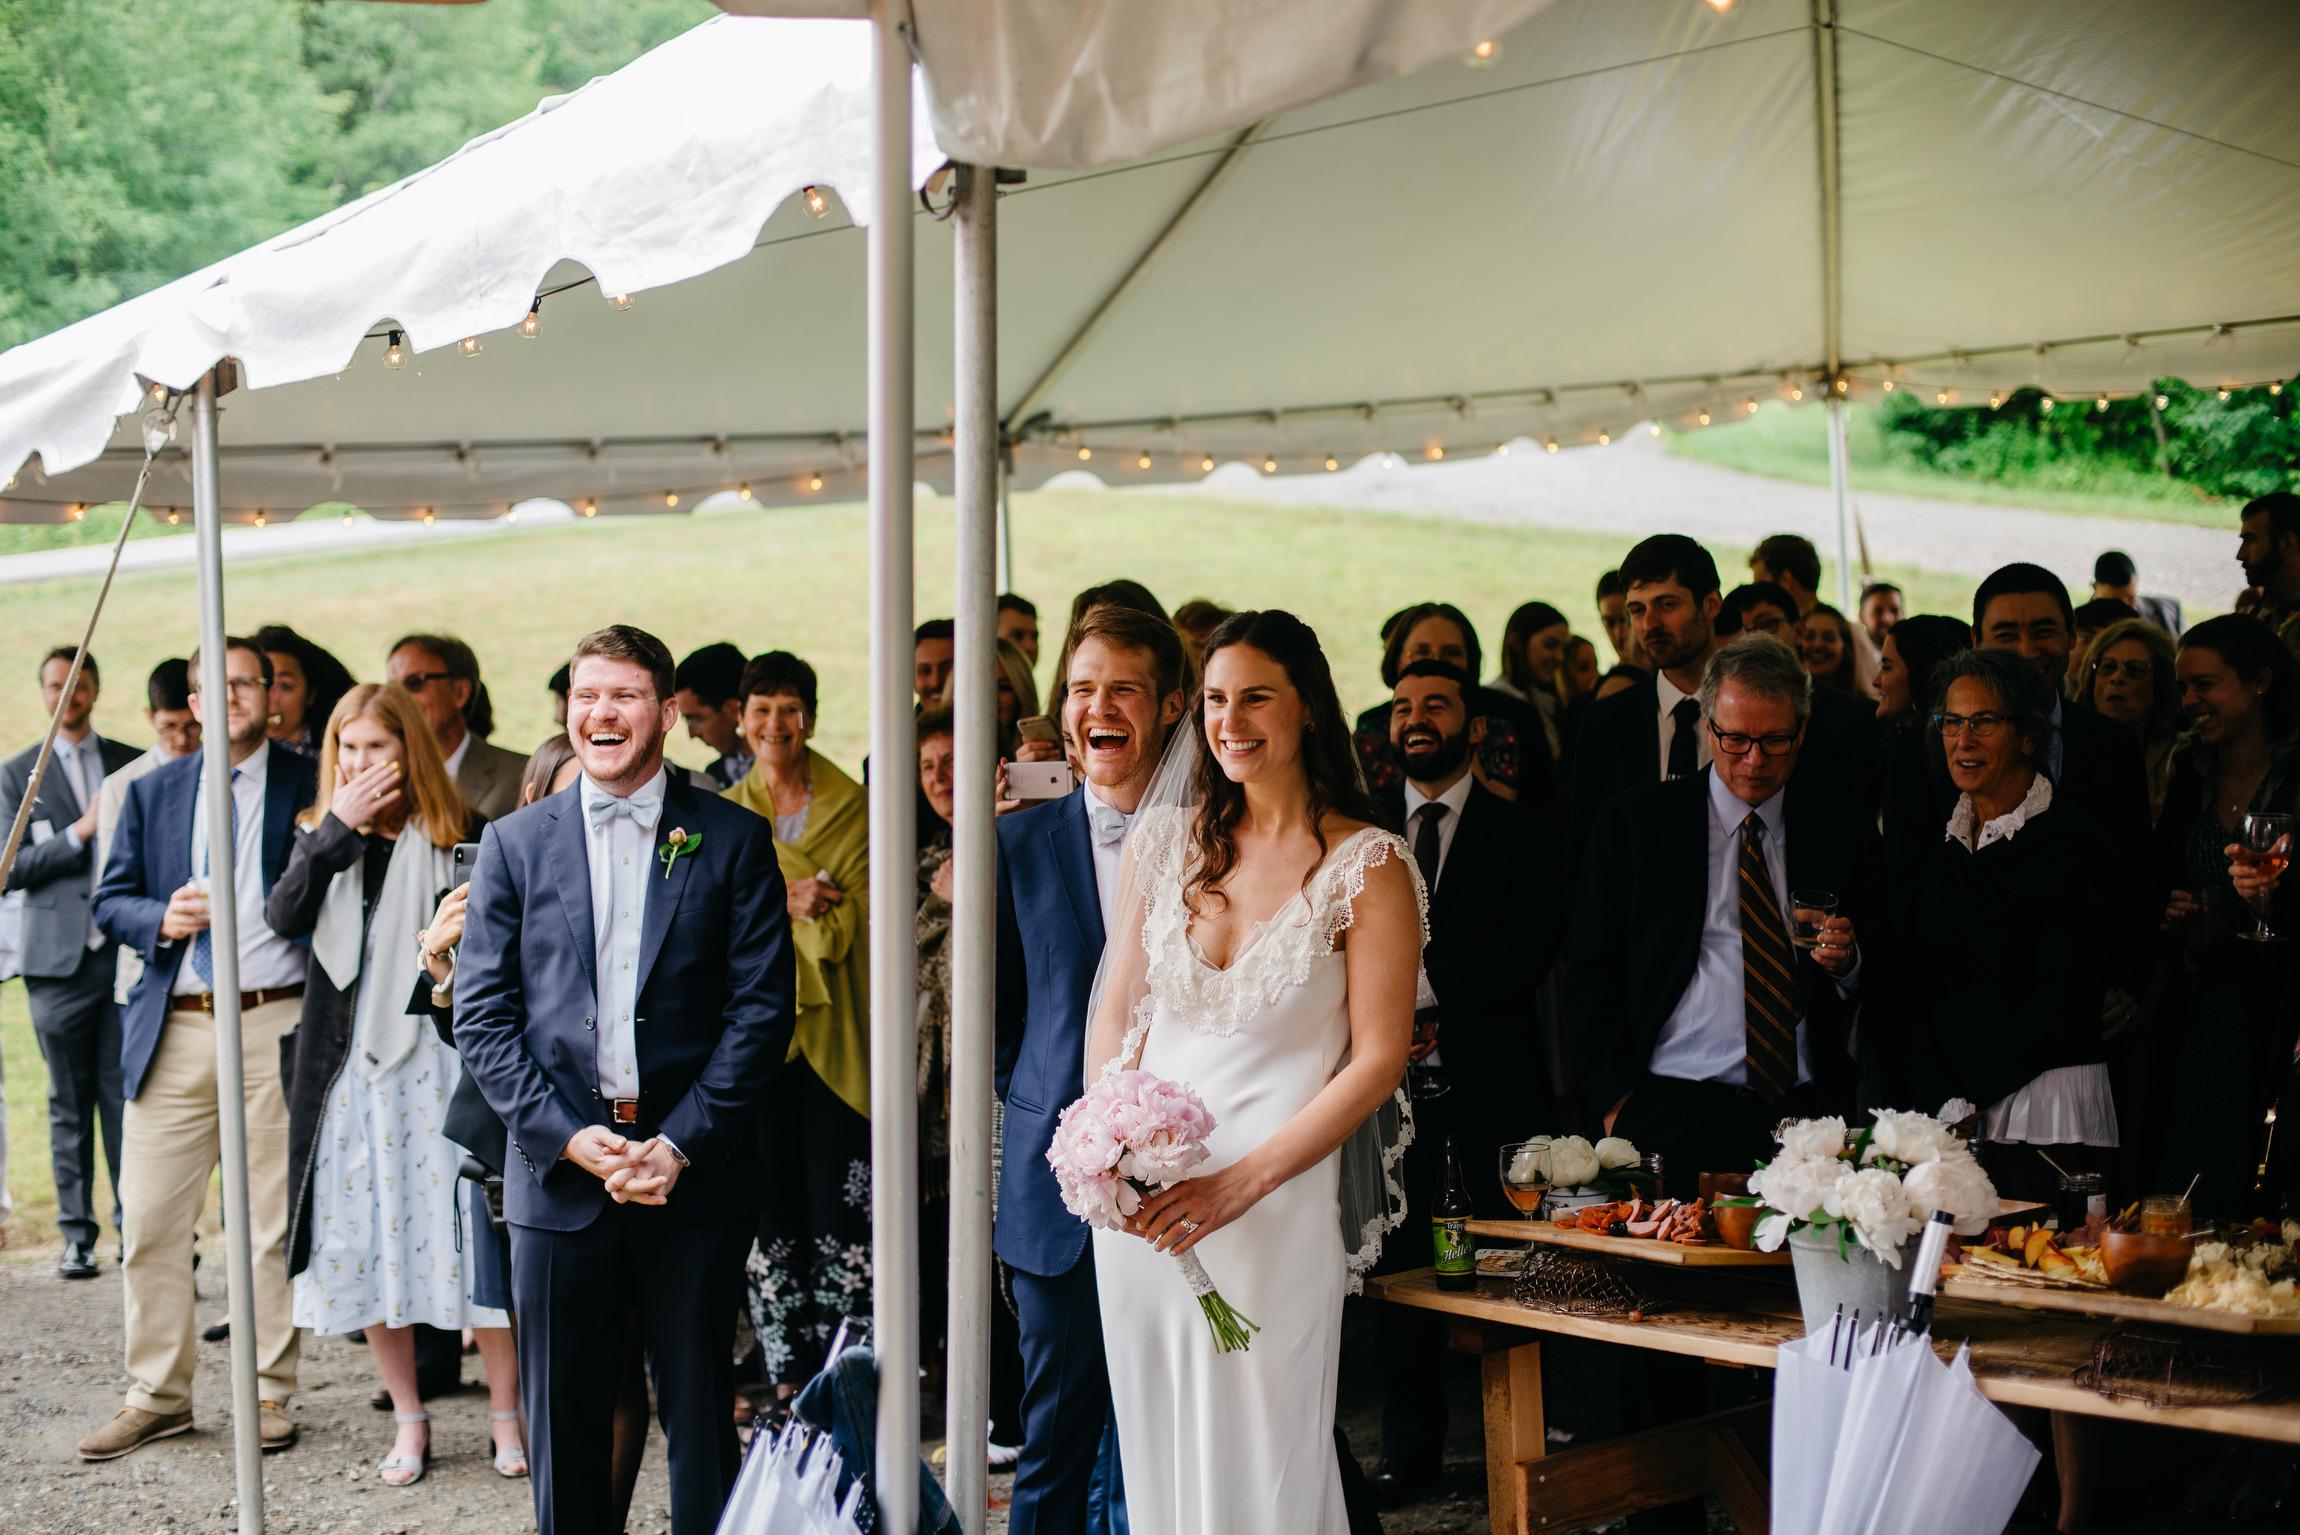 vermont_farm_wedding_photos_mikhail_glabetS_44.JPG